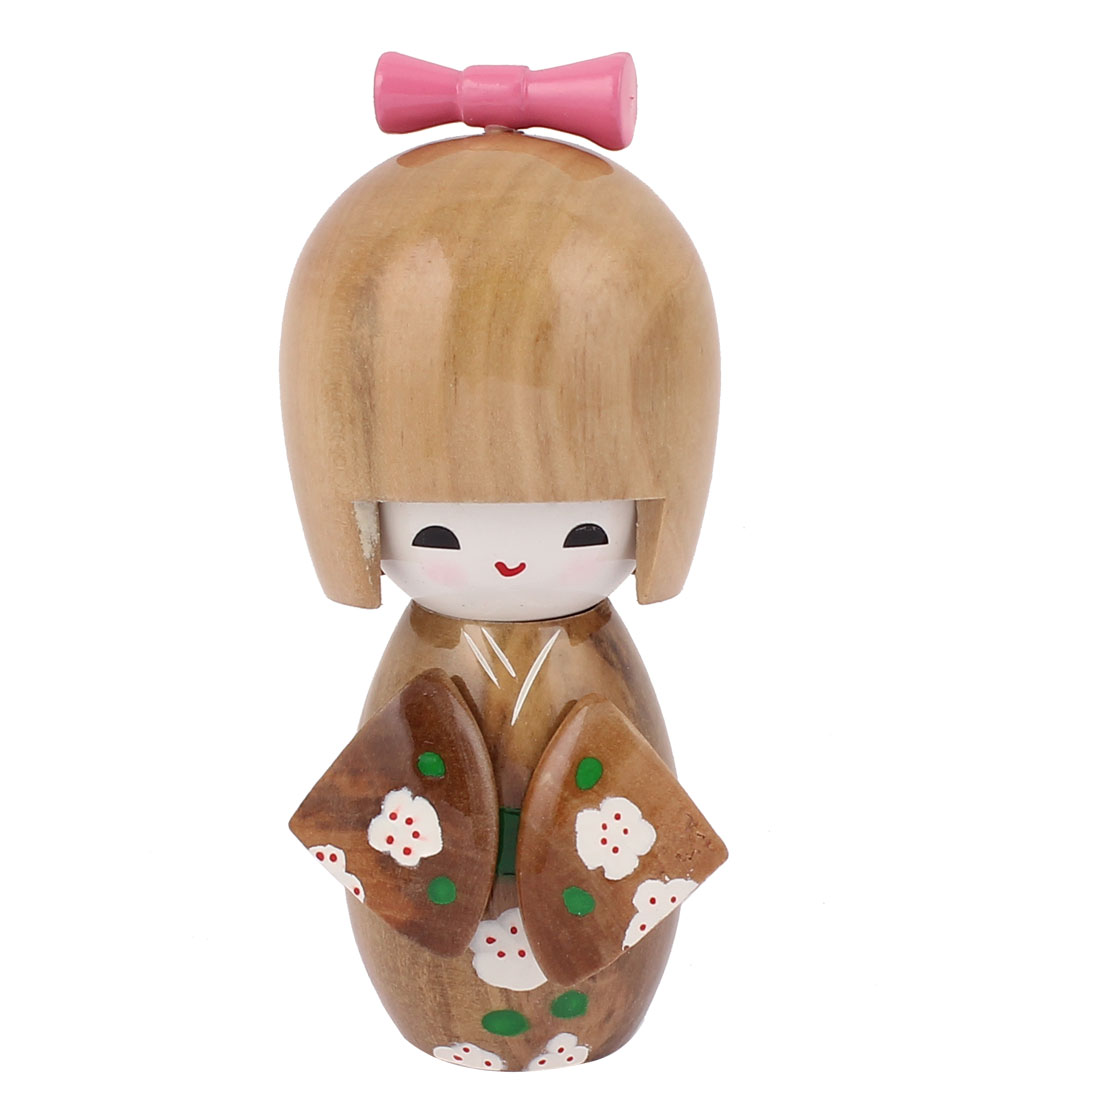 Manual Floral Decor Kimono Wooden Craft Gift Japanese Kokeshi Doll Brown